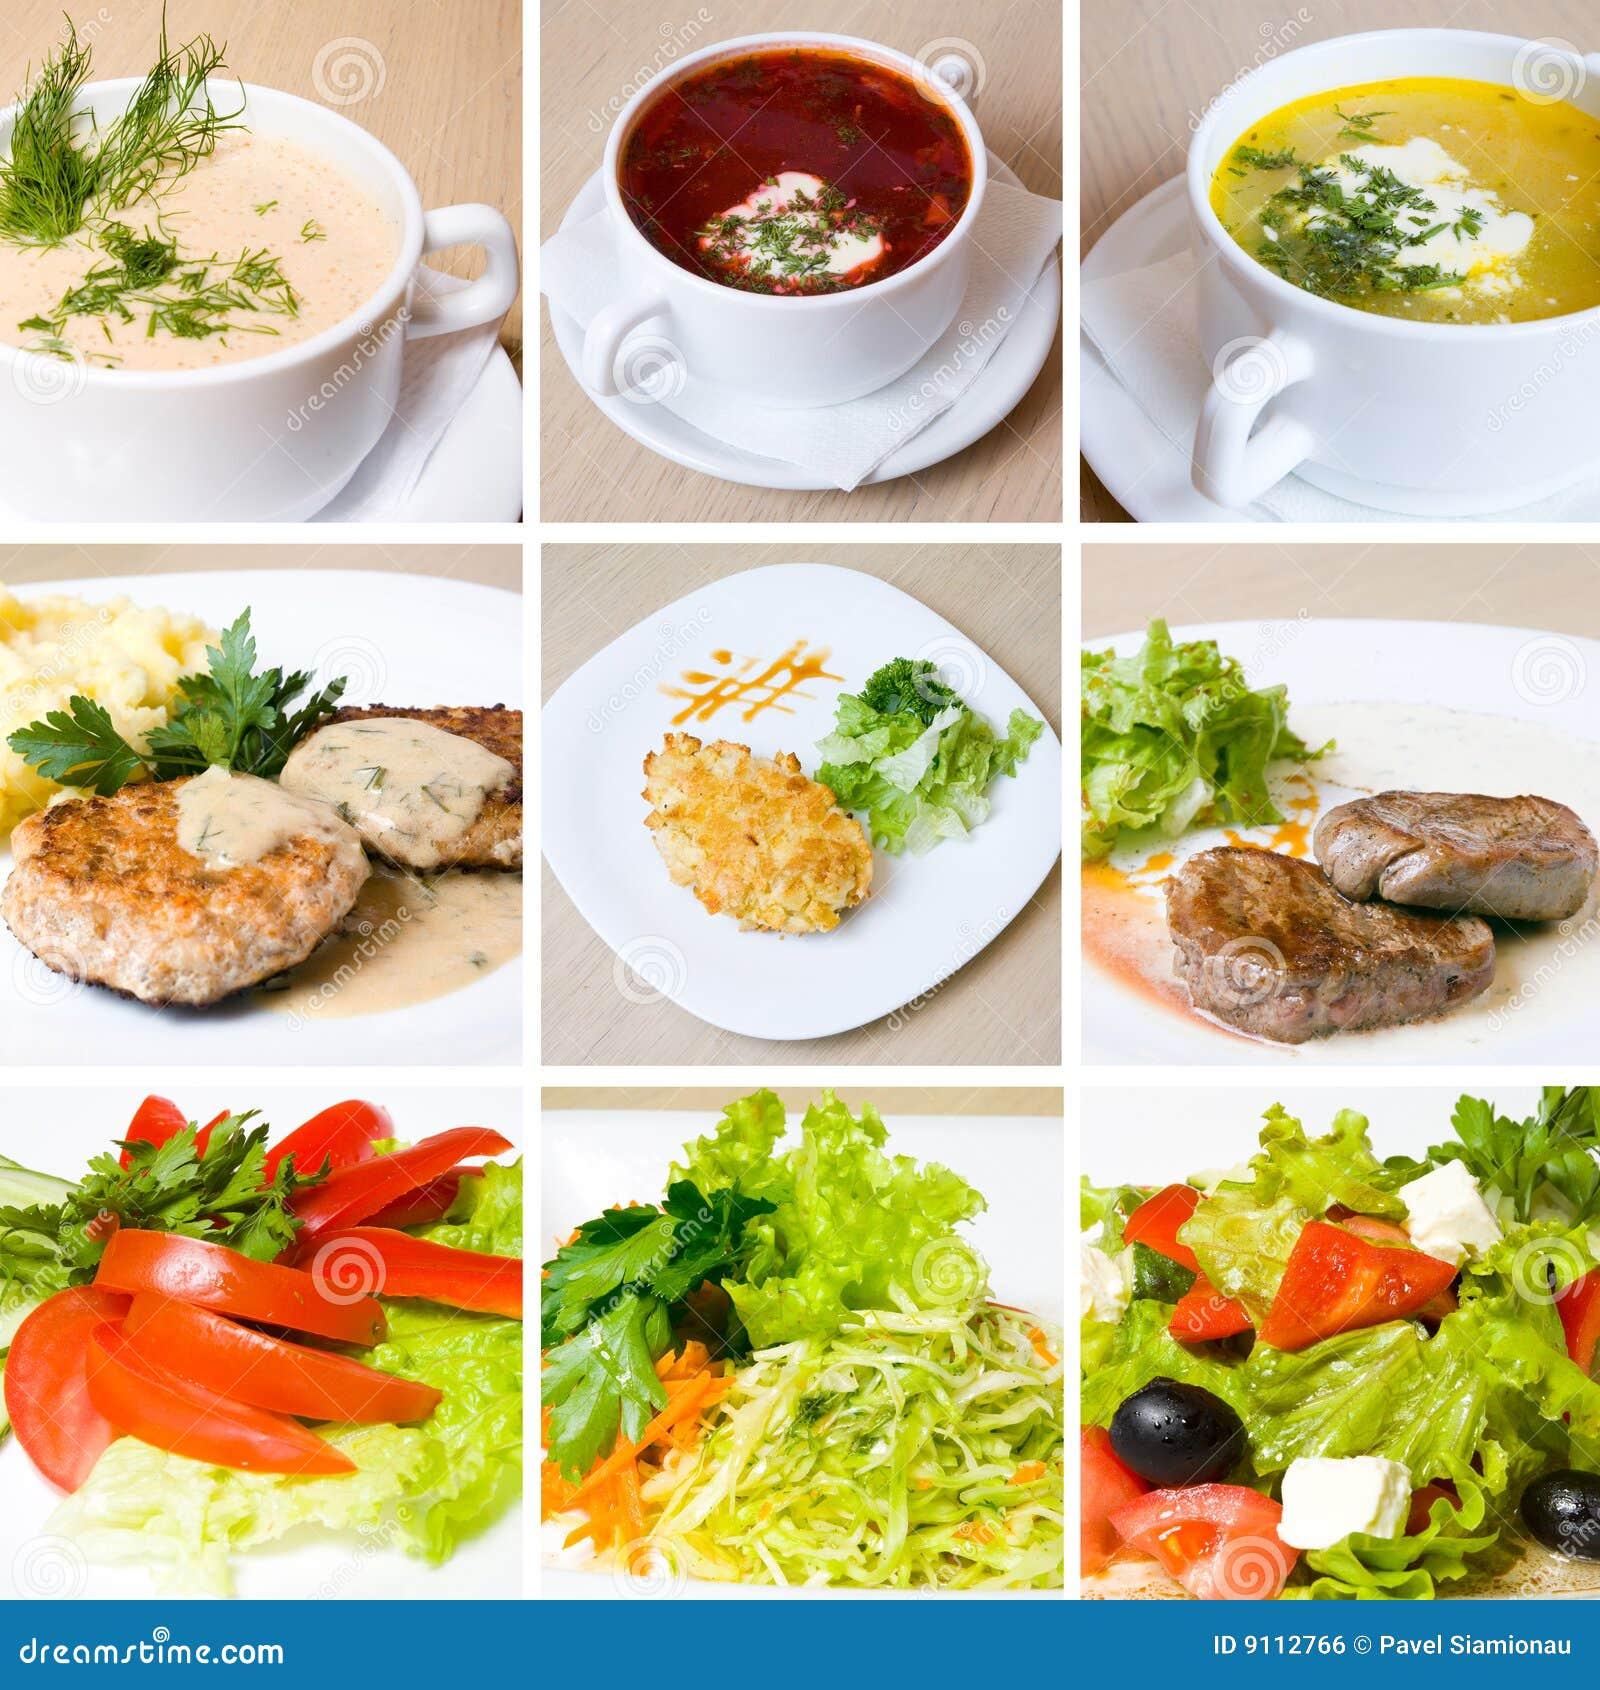 soup and salad business plan